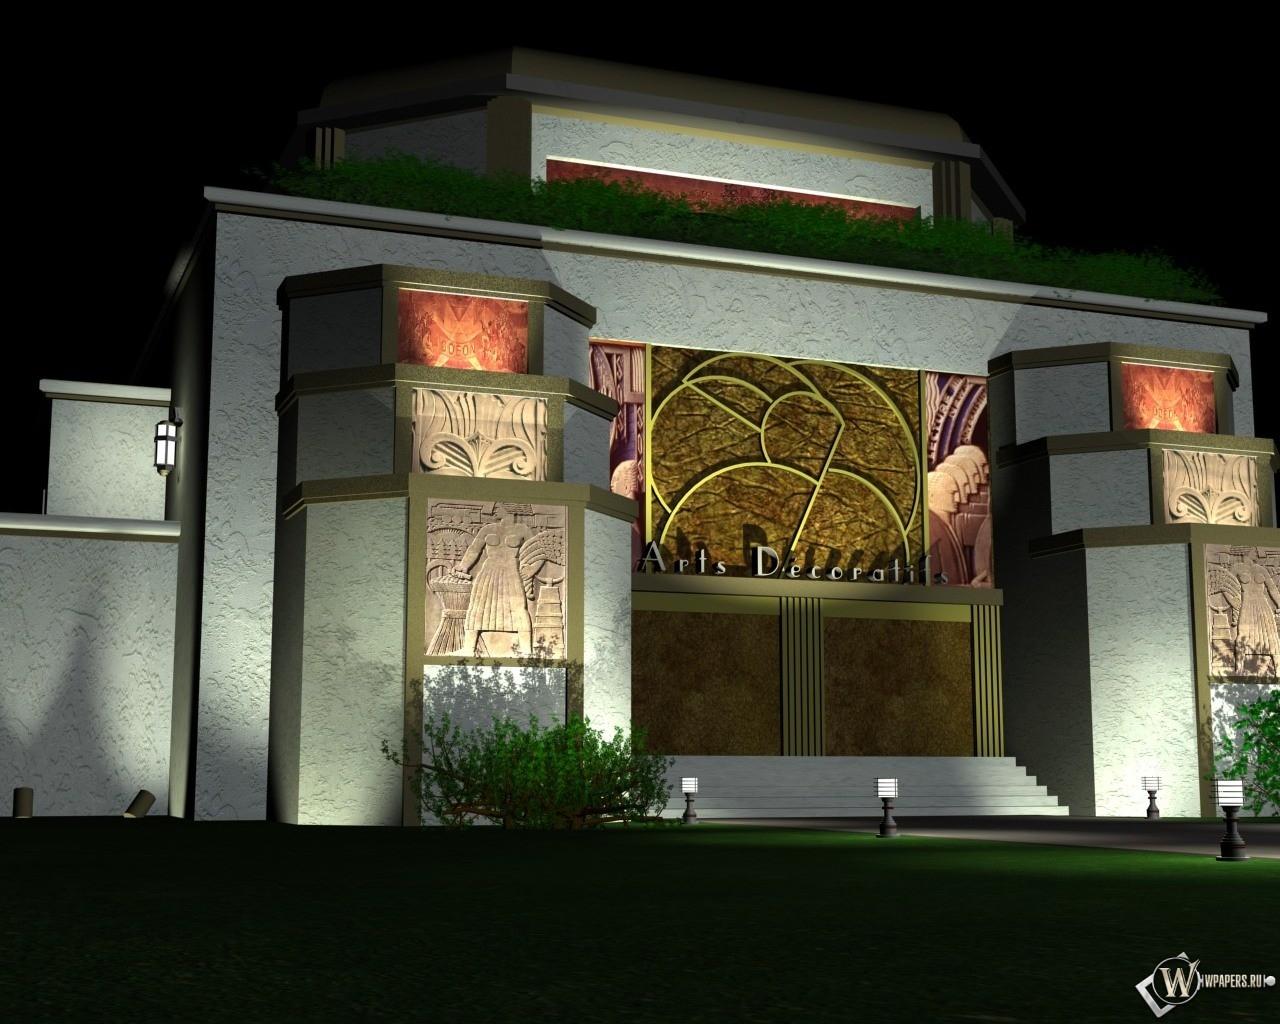 Art Deco Building - New York 1280x1024